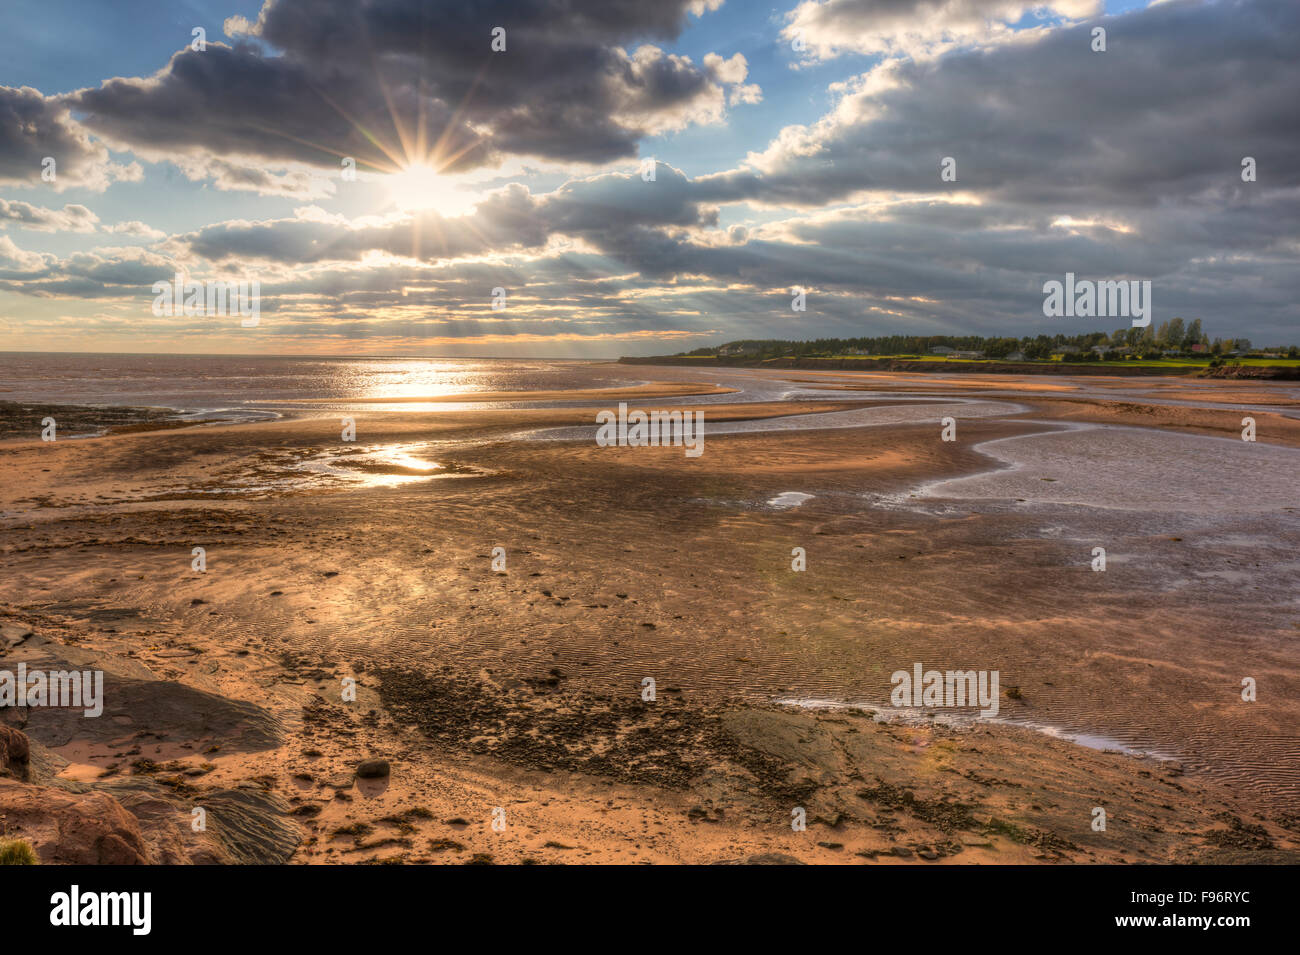 Sunrays breaking throug clouds, Canoe Cove Beach, Prince Edward Island, Canada - Stock Image